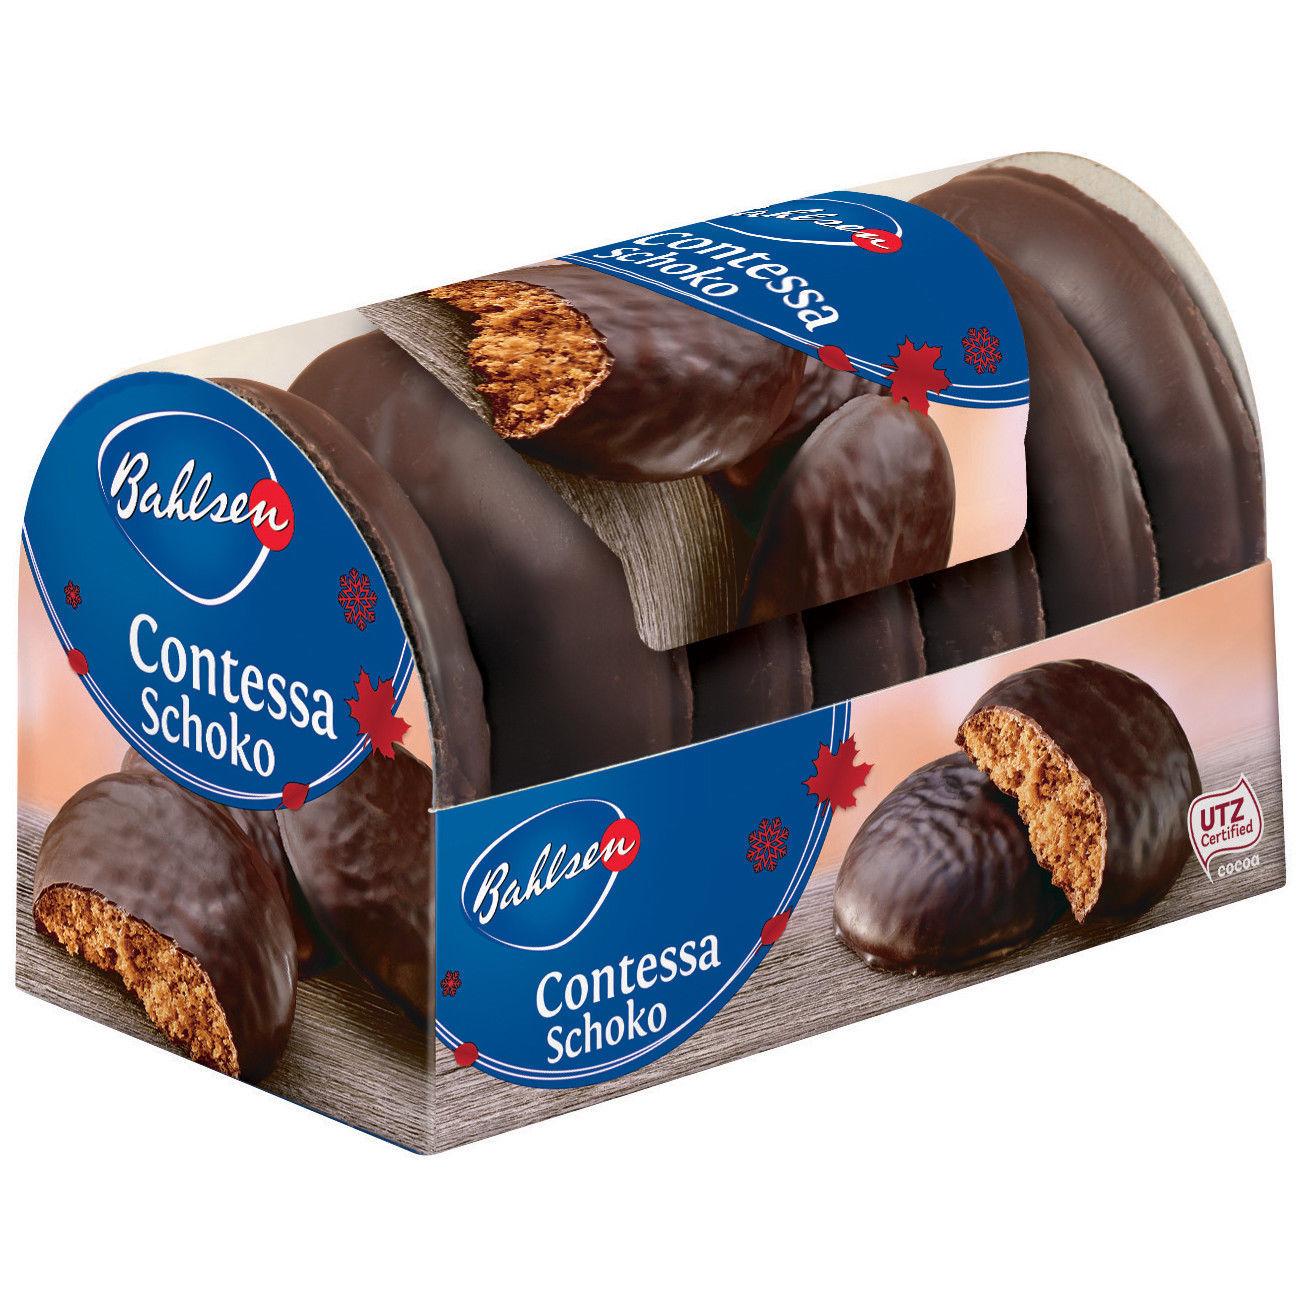 Bahlsen CONTESSA SCHOKO lebkuchen gingerbread cookies -200g-FREE SHIPPING-